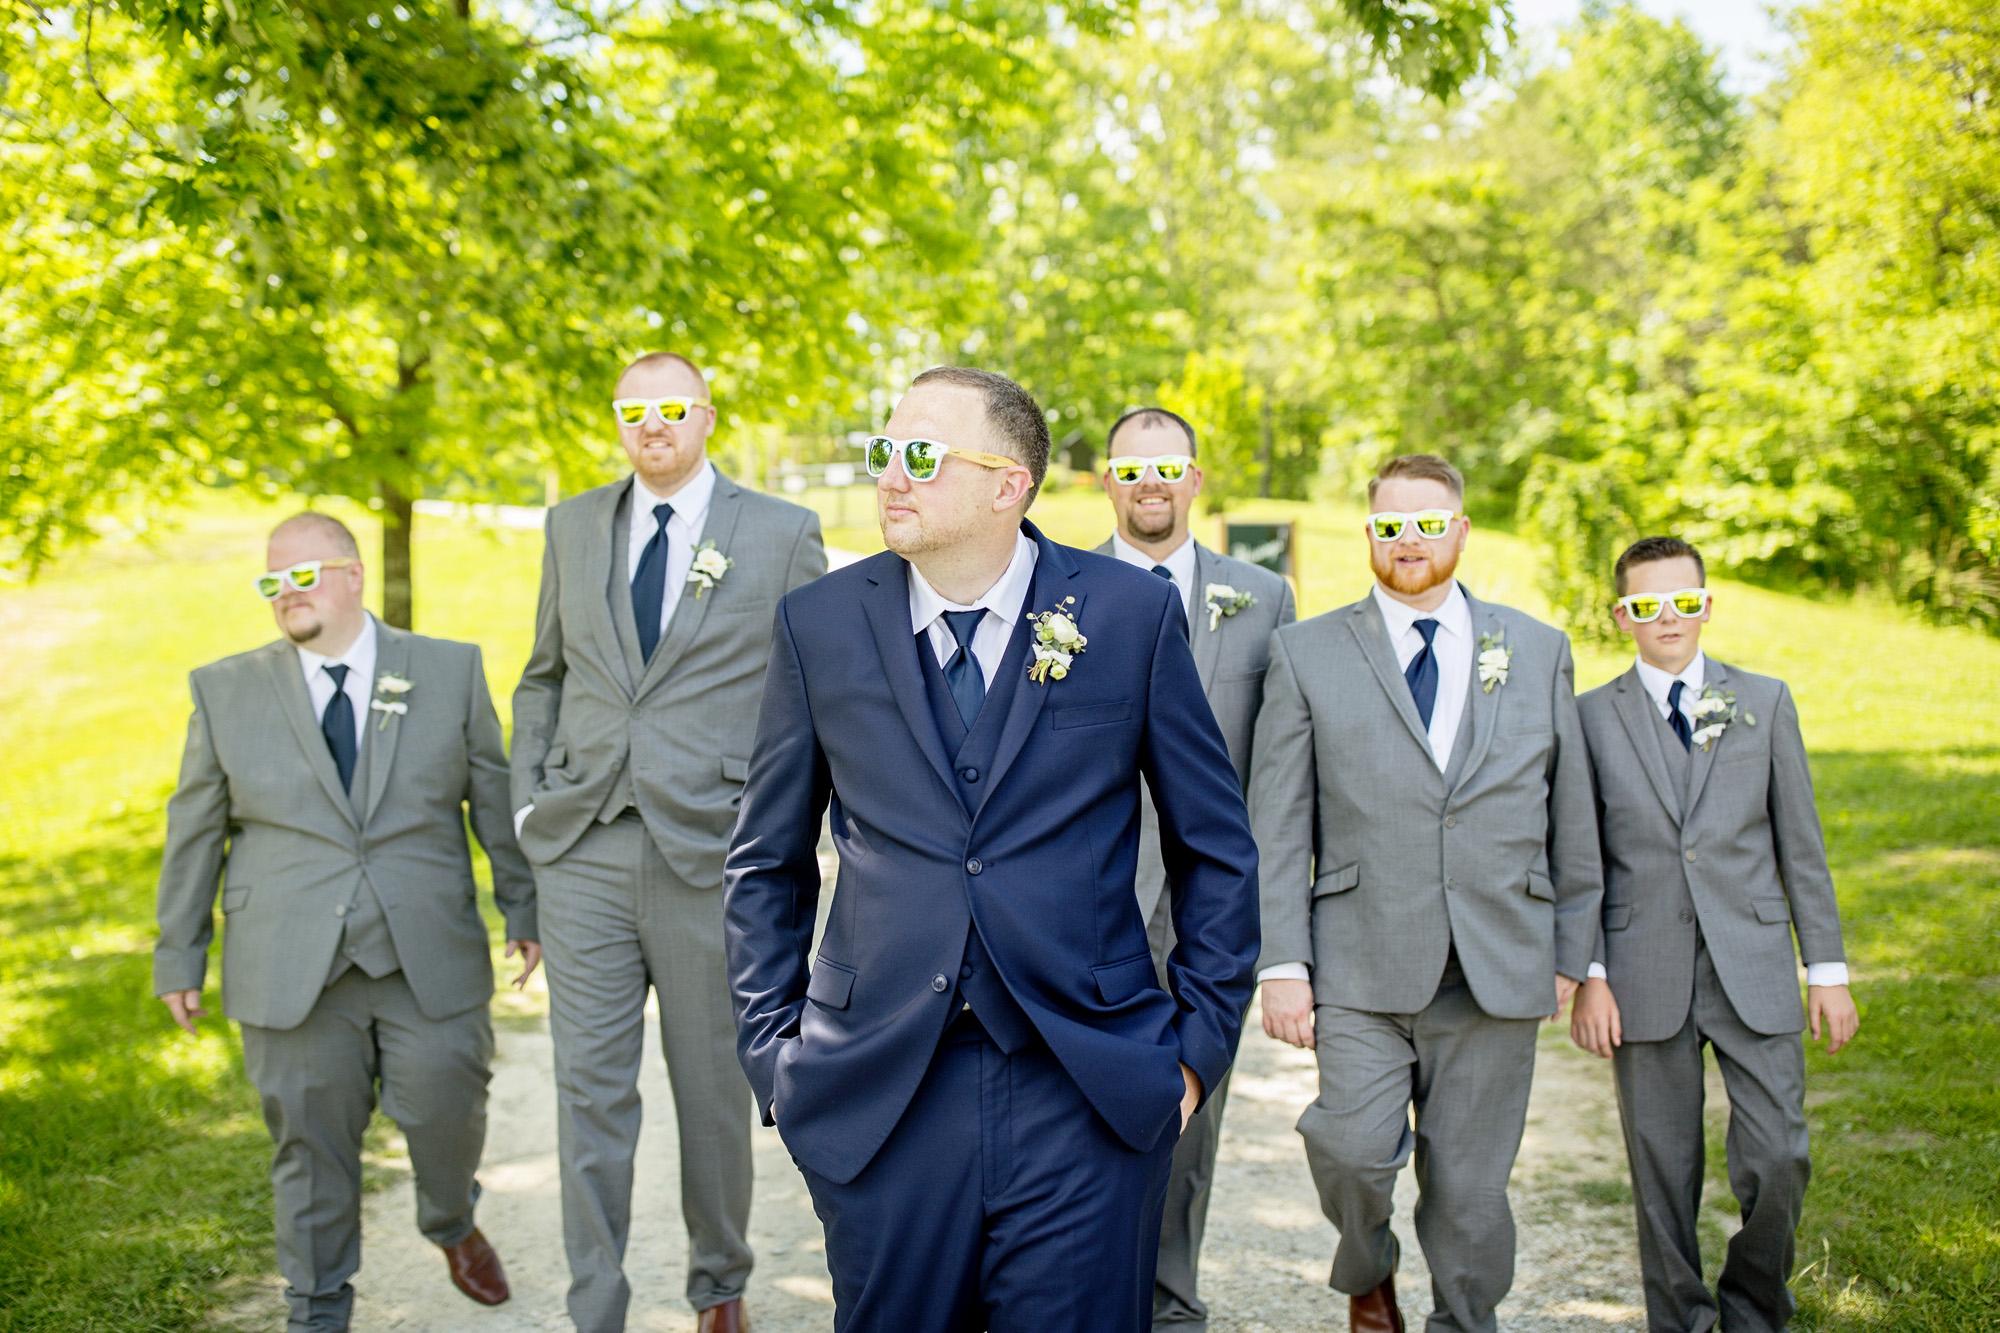 Seriously_Sabrina_Photography_Red_River_Gorge_Wedding_Barn_Robinson45.jpg